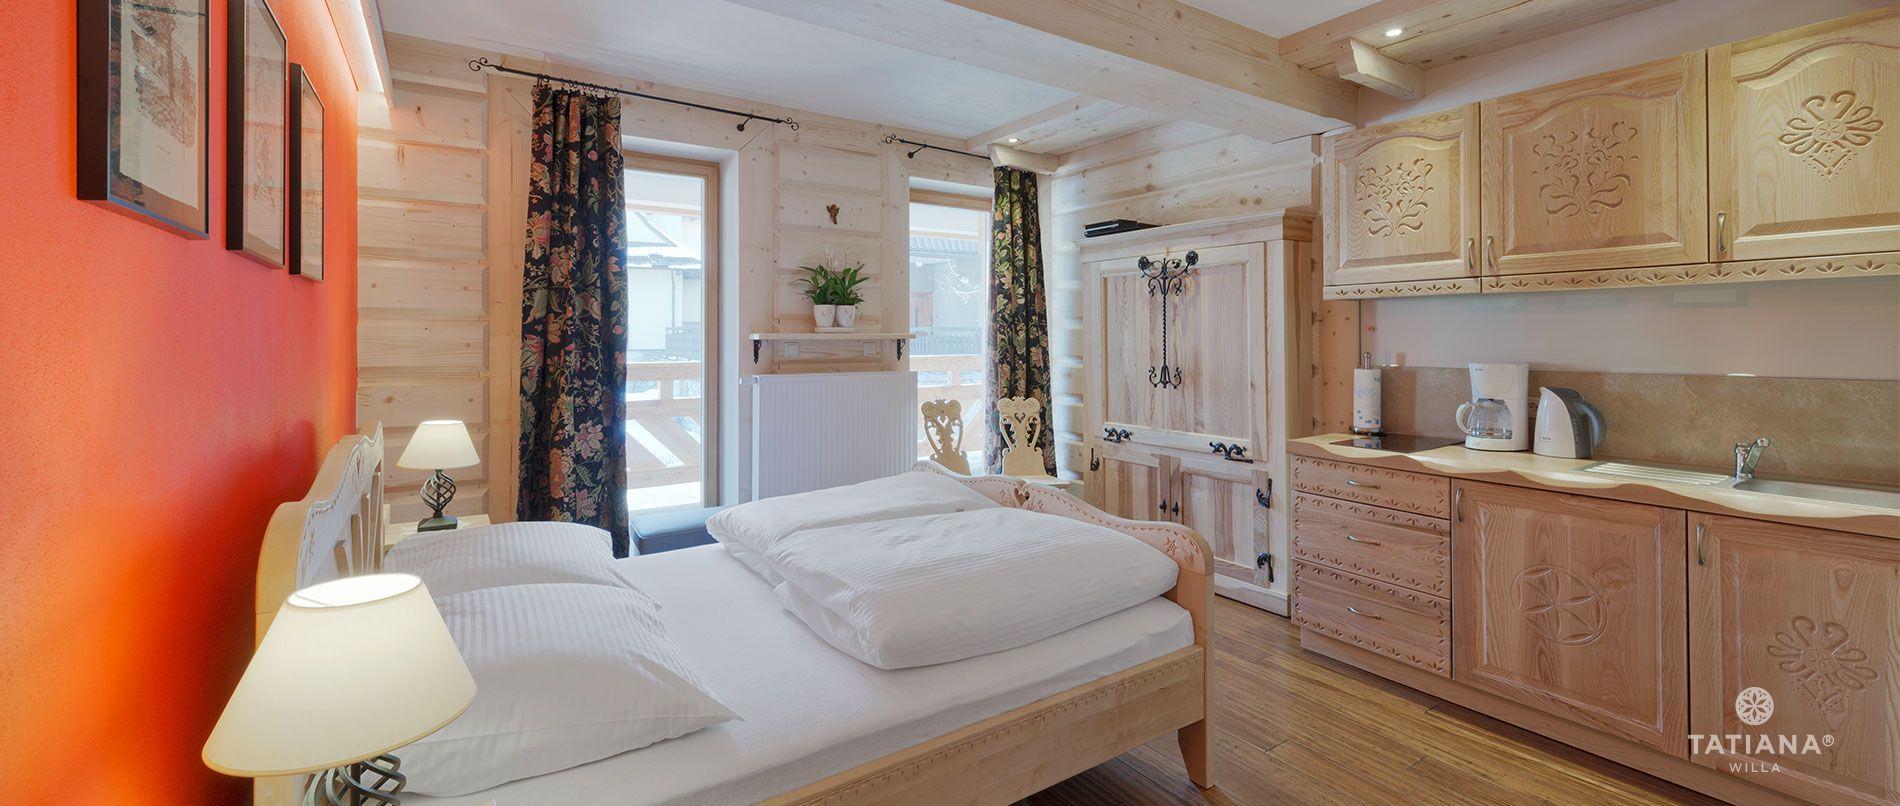 Apartament Lux10- salon